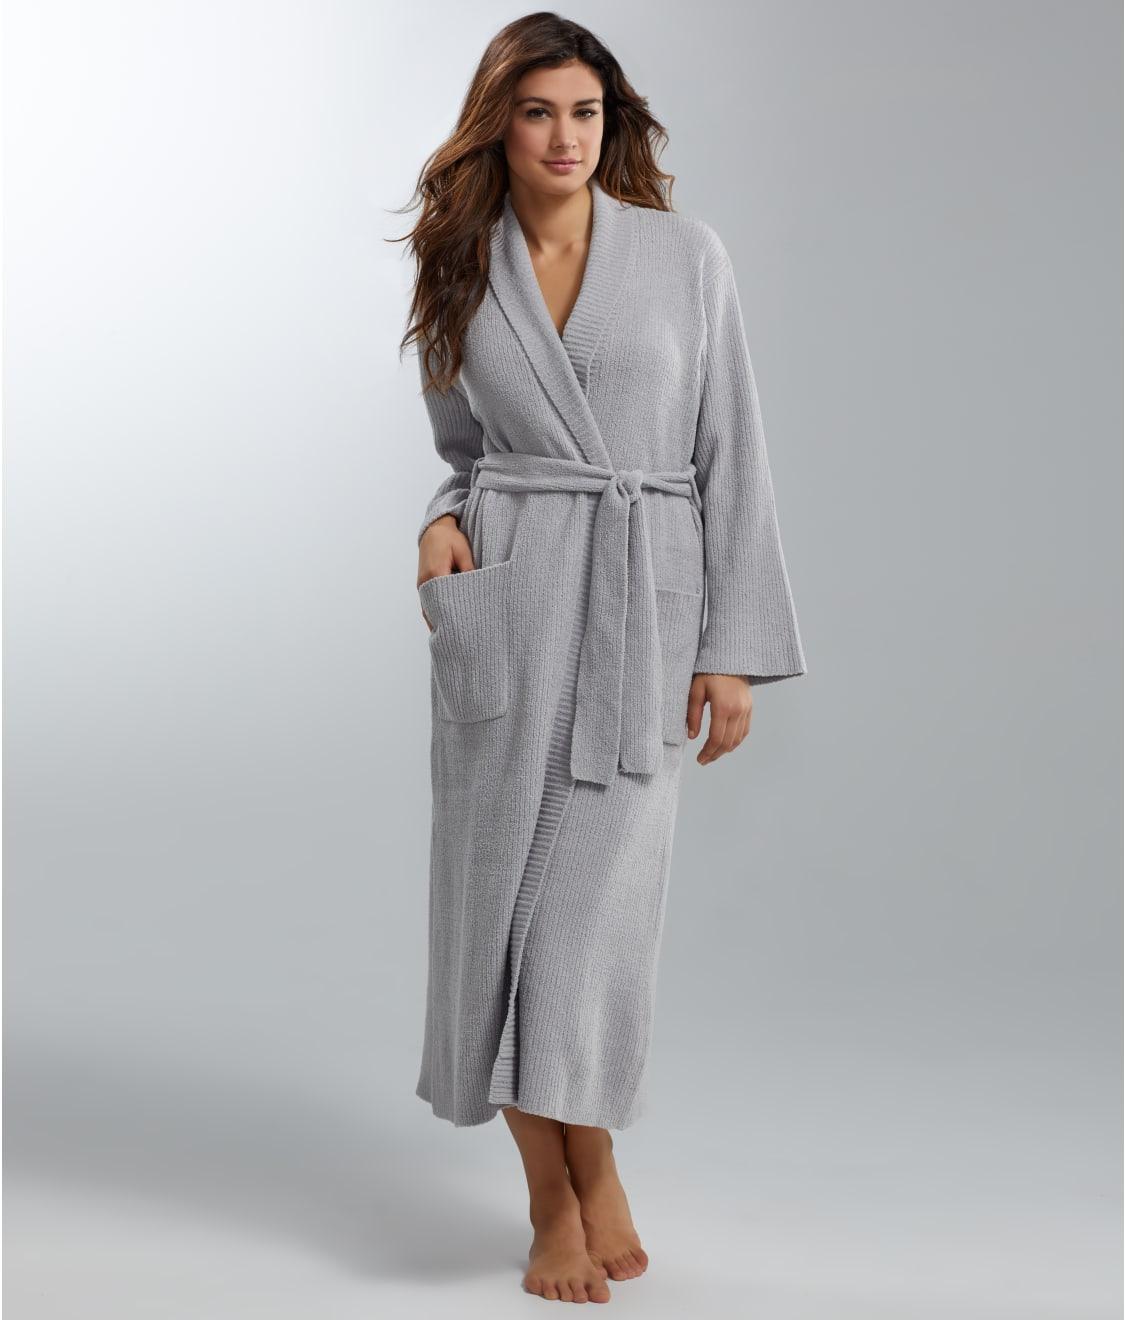 N Natori Rib Chenille Robe Sleepwear XC4021 at BareNecessities.com